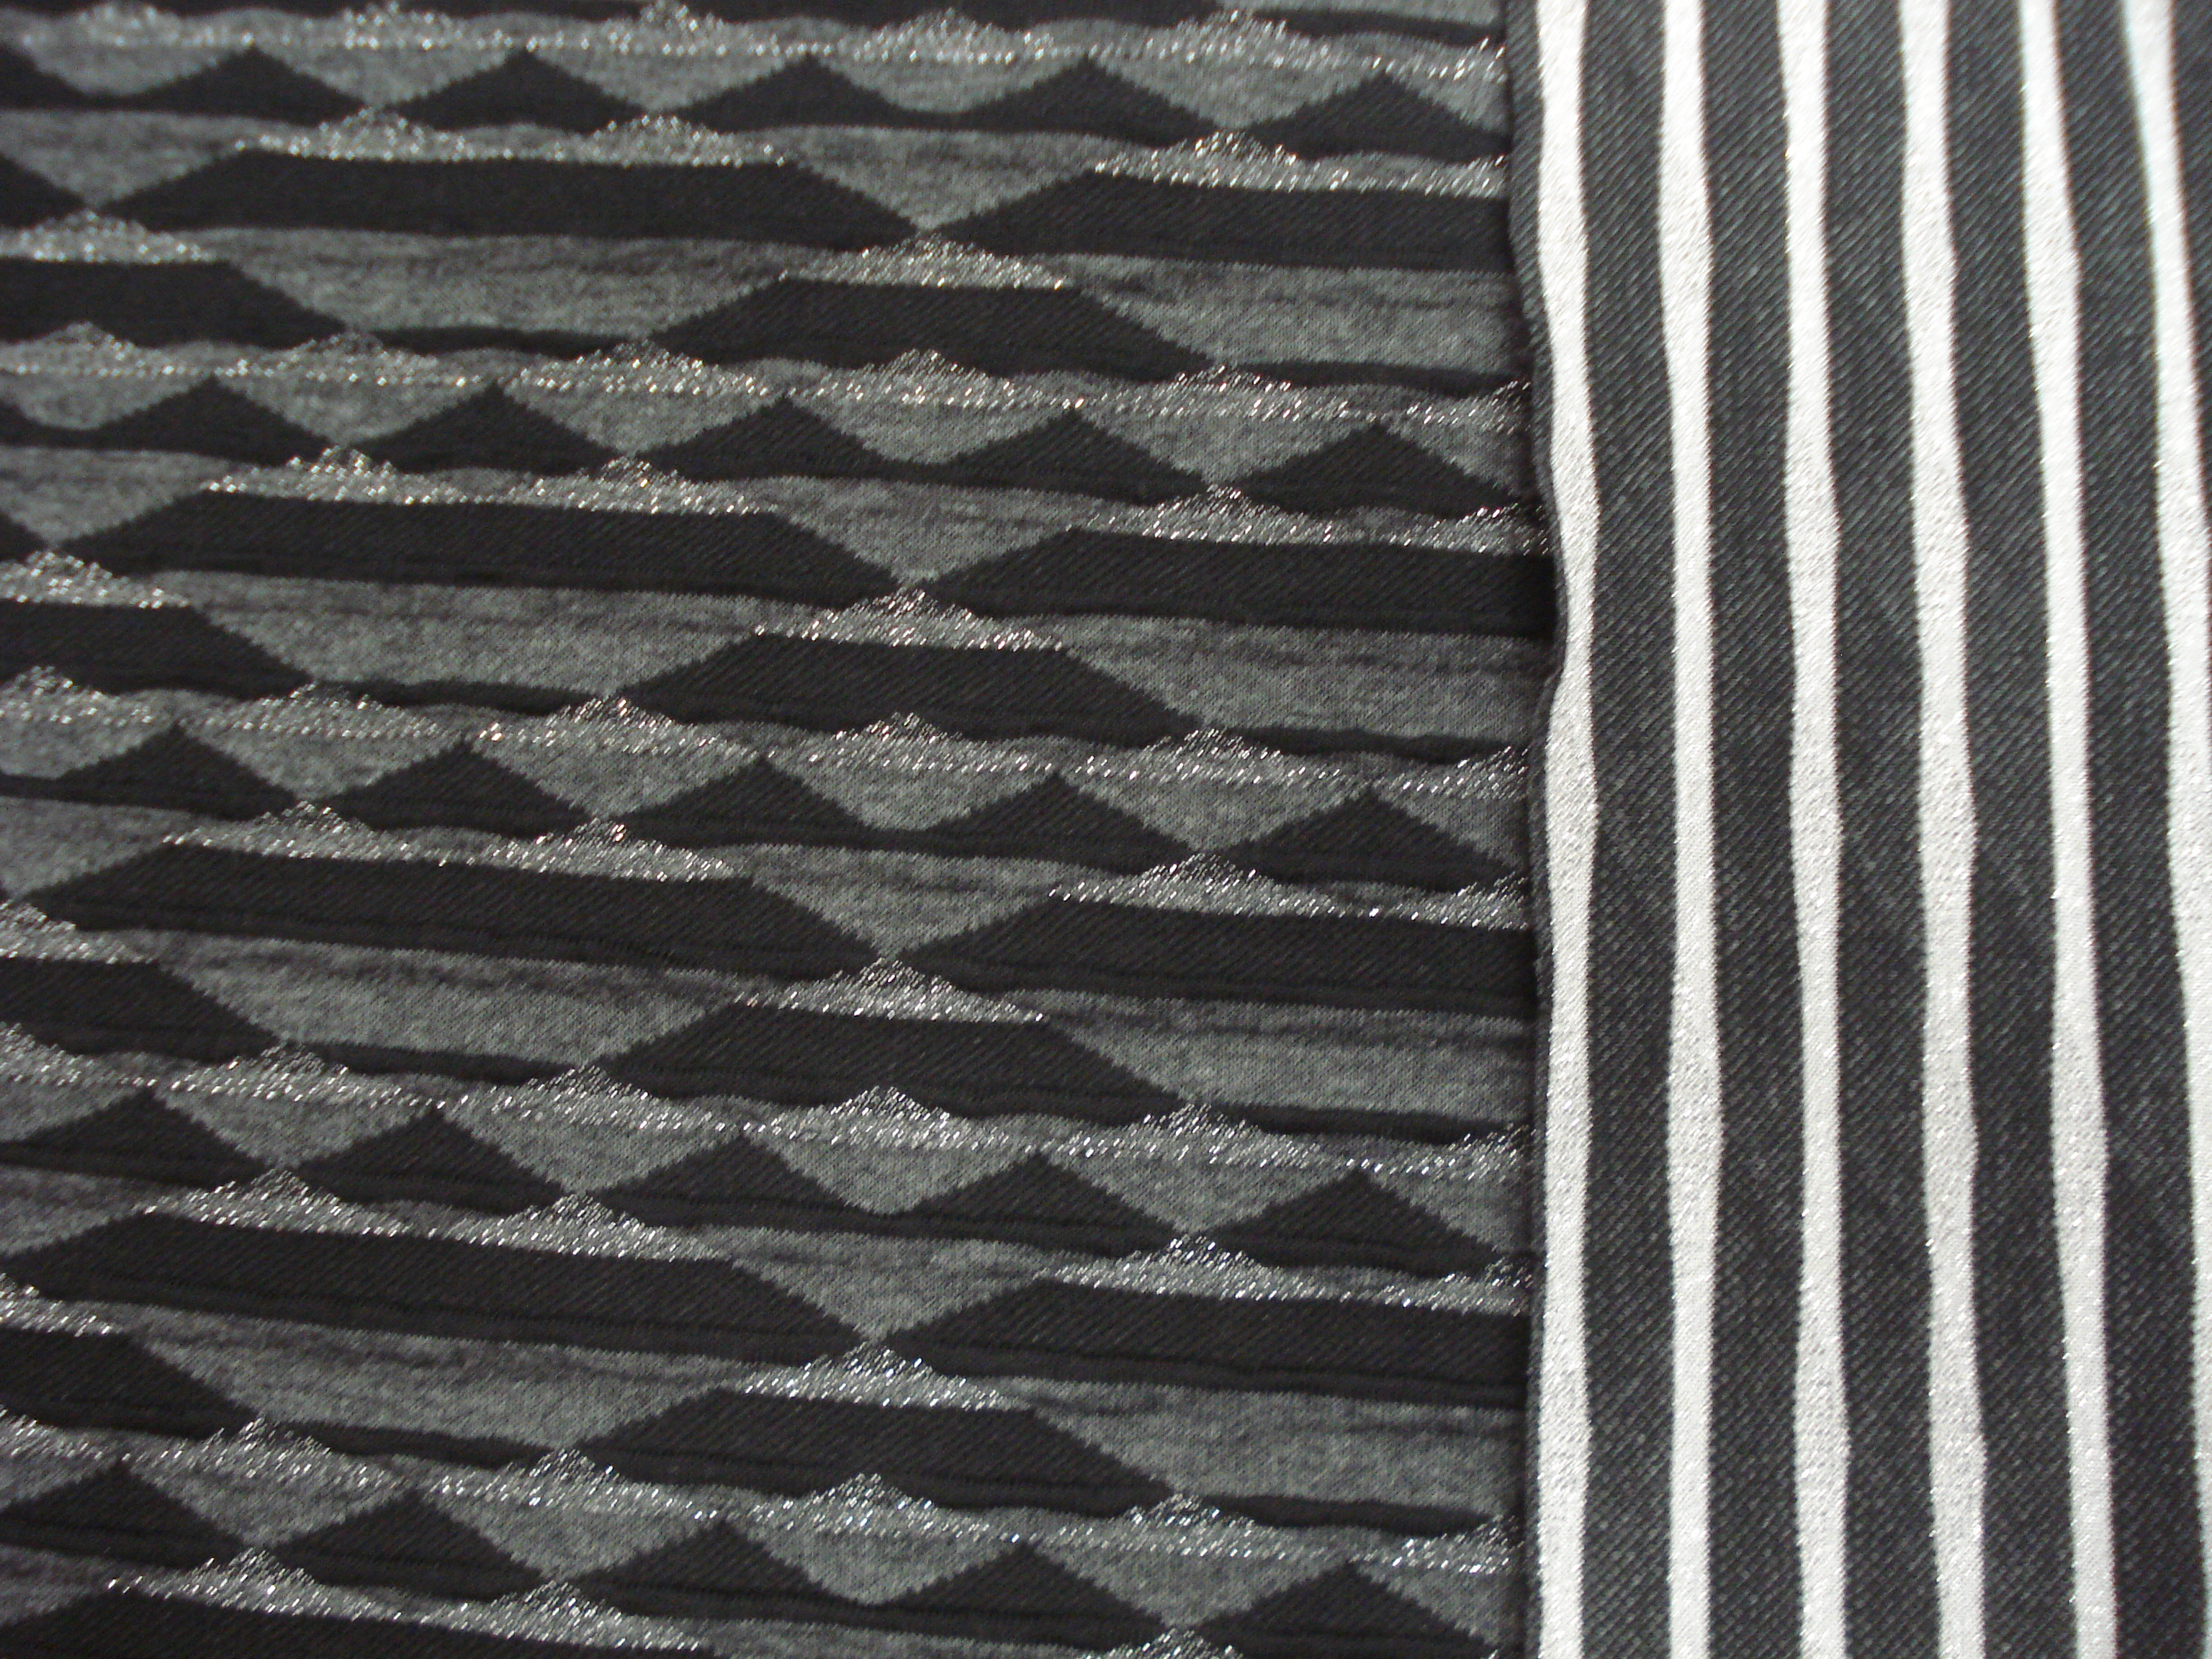 Tricot jaquard zwart met lurex (kopie)